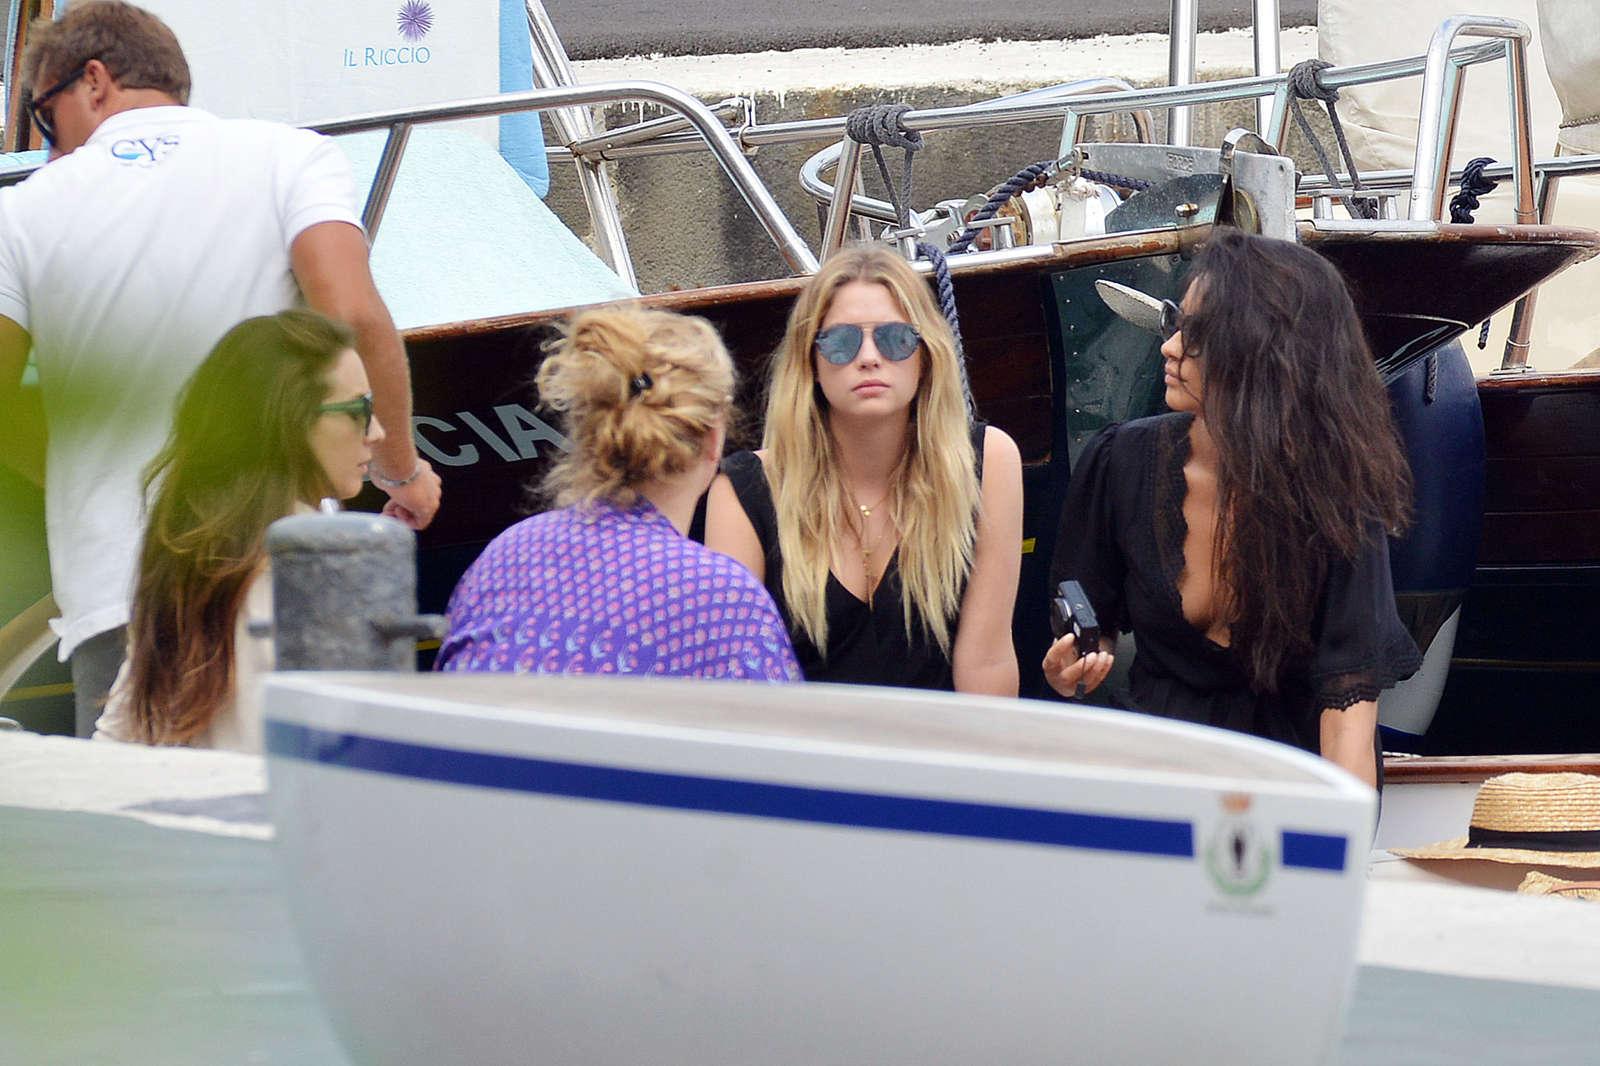 Ashley Benson 2016 : Ashley Benson, Shay Mitchell and Troian Bellisario on a boat in Capri -25